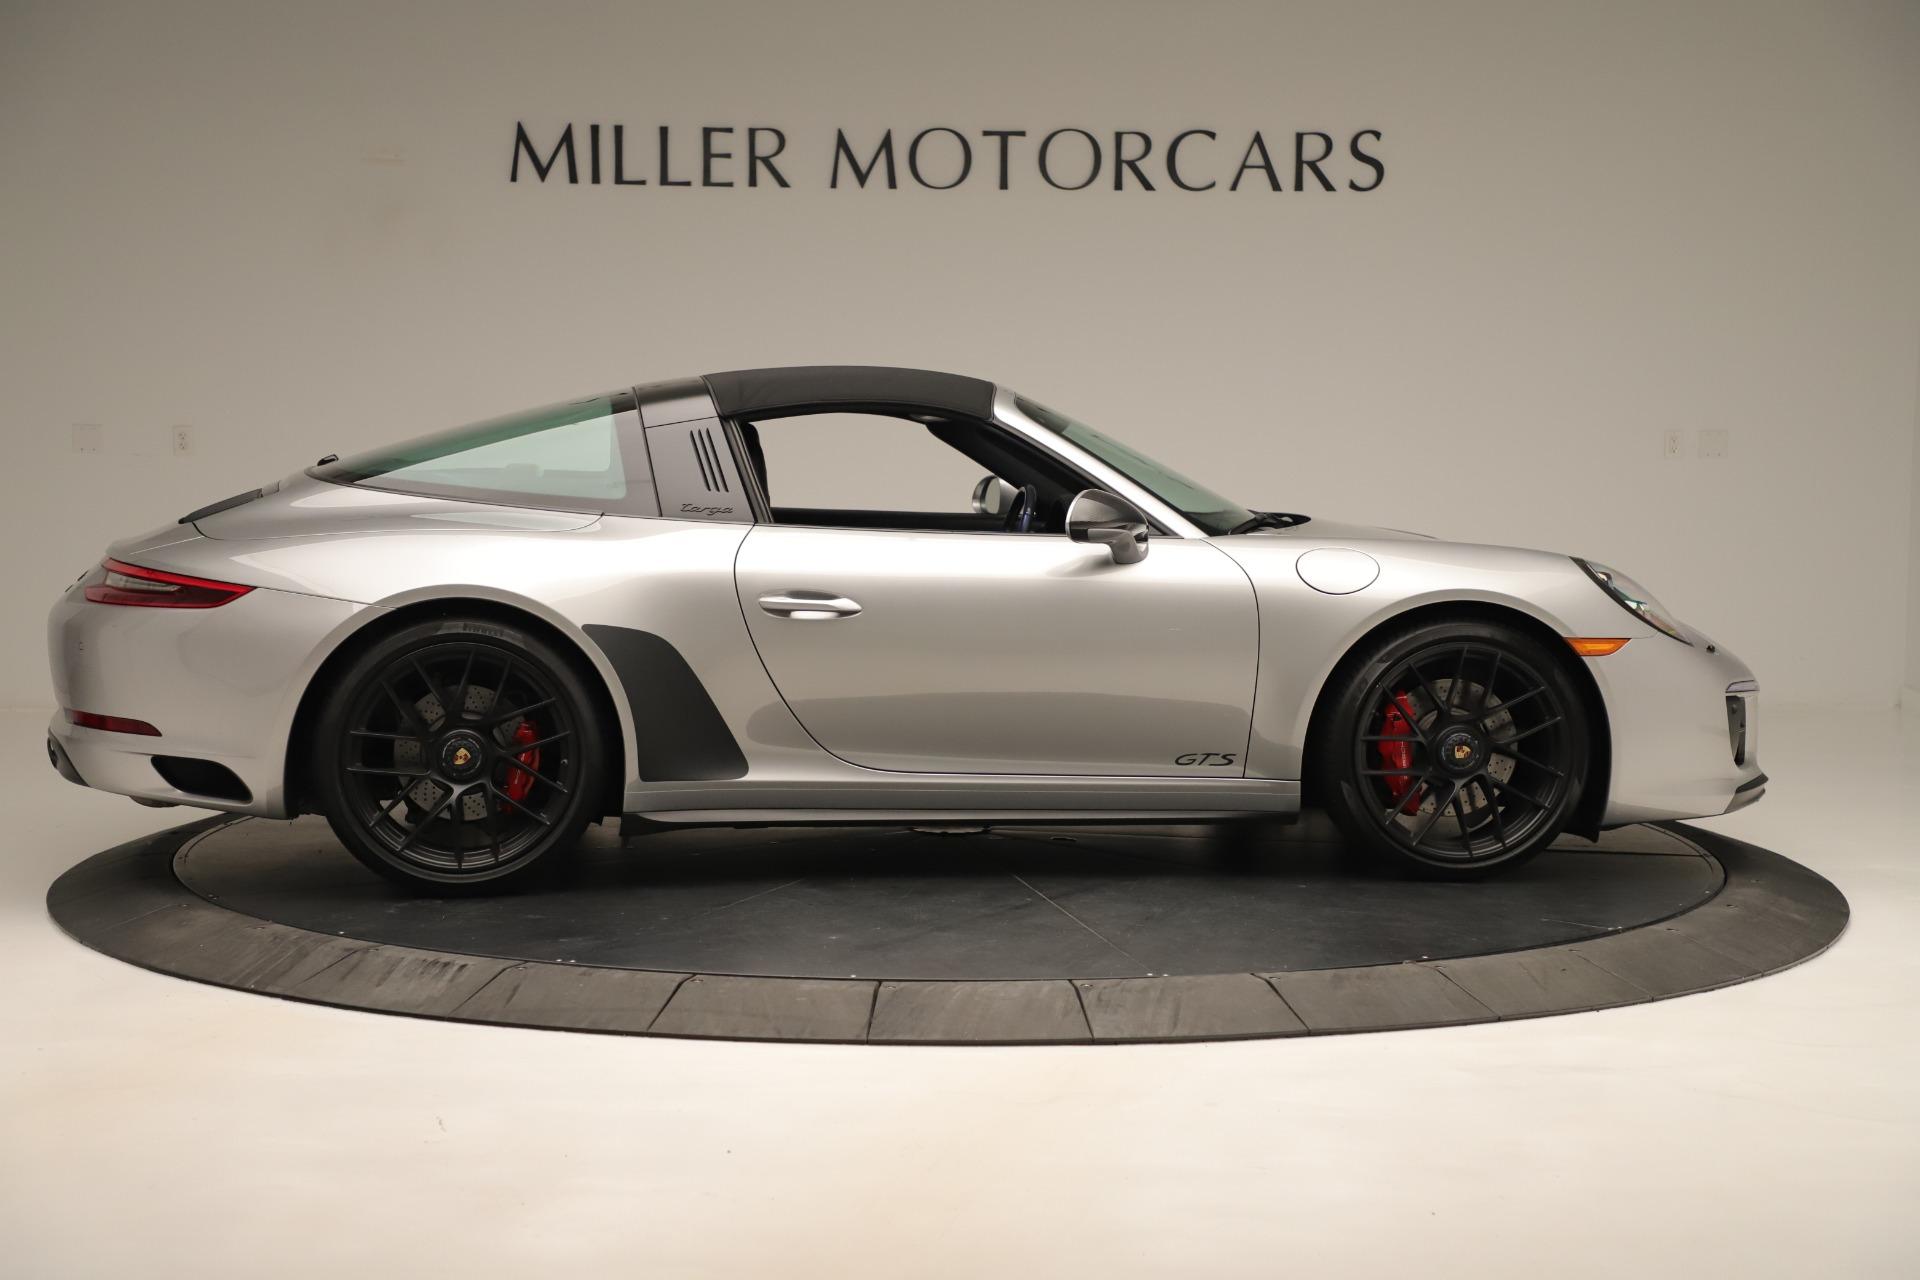 Used 2017 Porsche 911 Targa 4 GTS For Sale In Greenwich, CT 3374_p15